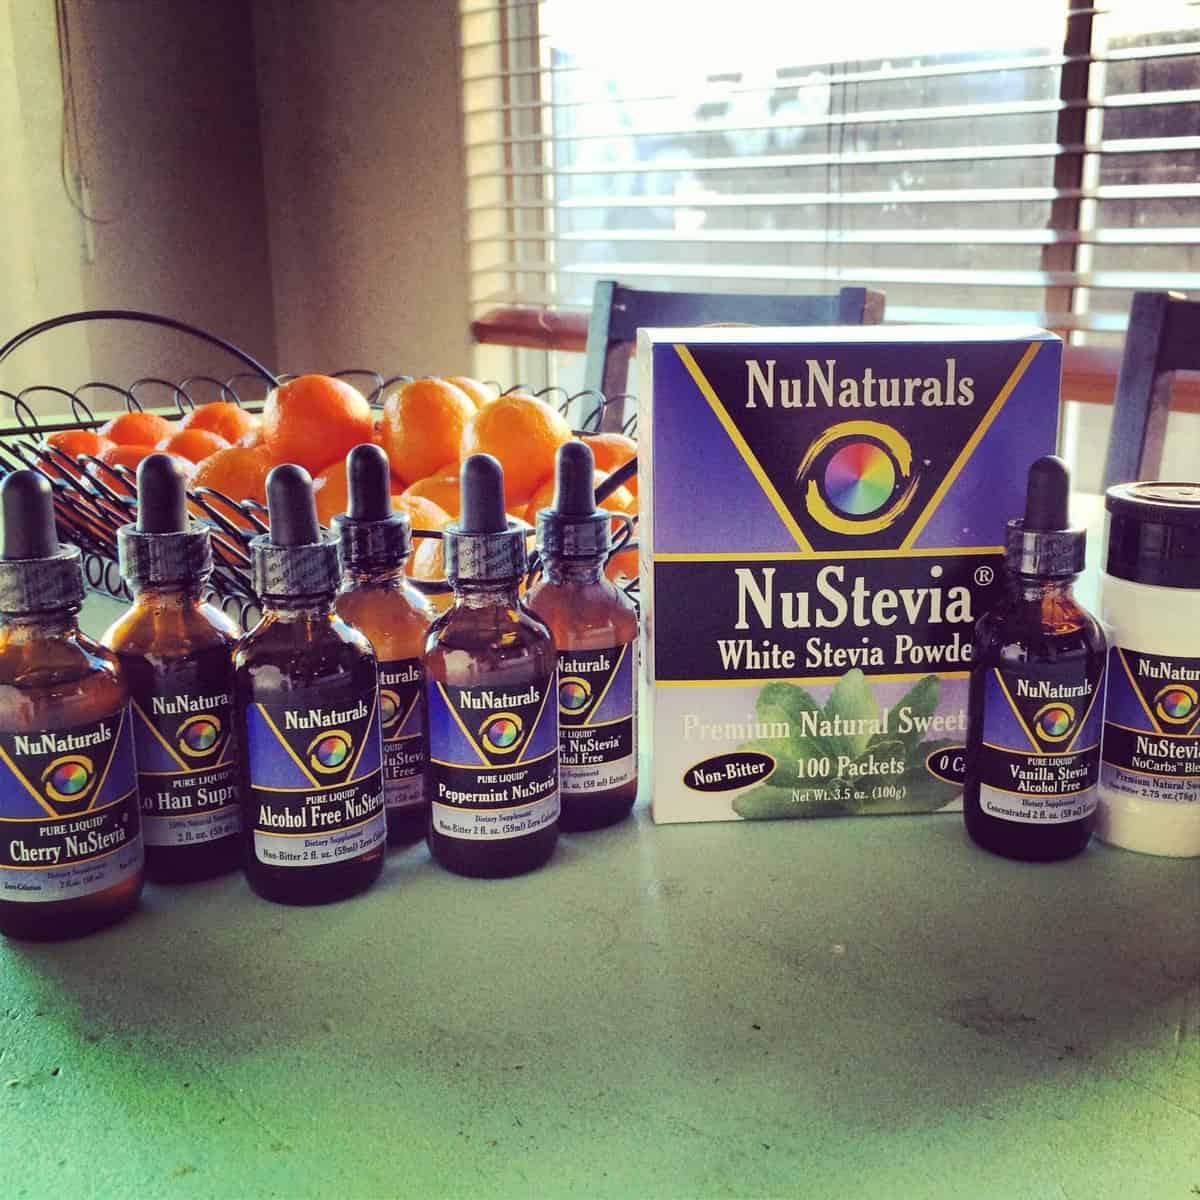 NuNaturals Gluten-Free Stevia Feature & Giveaway!!